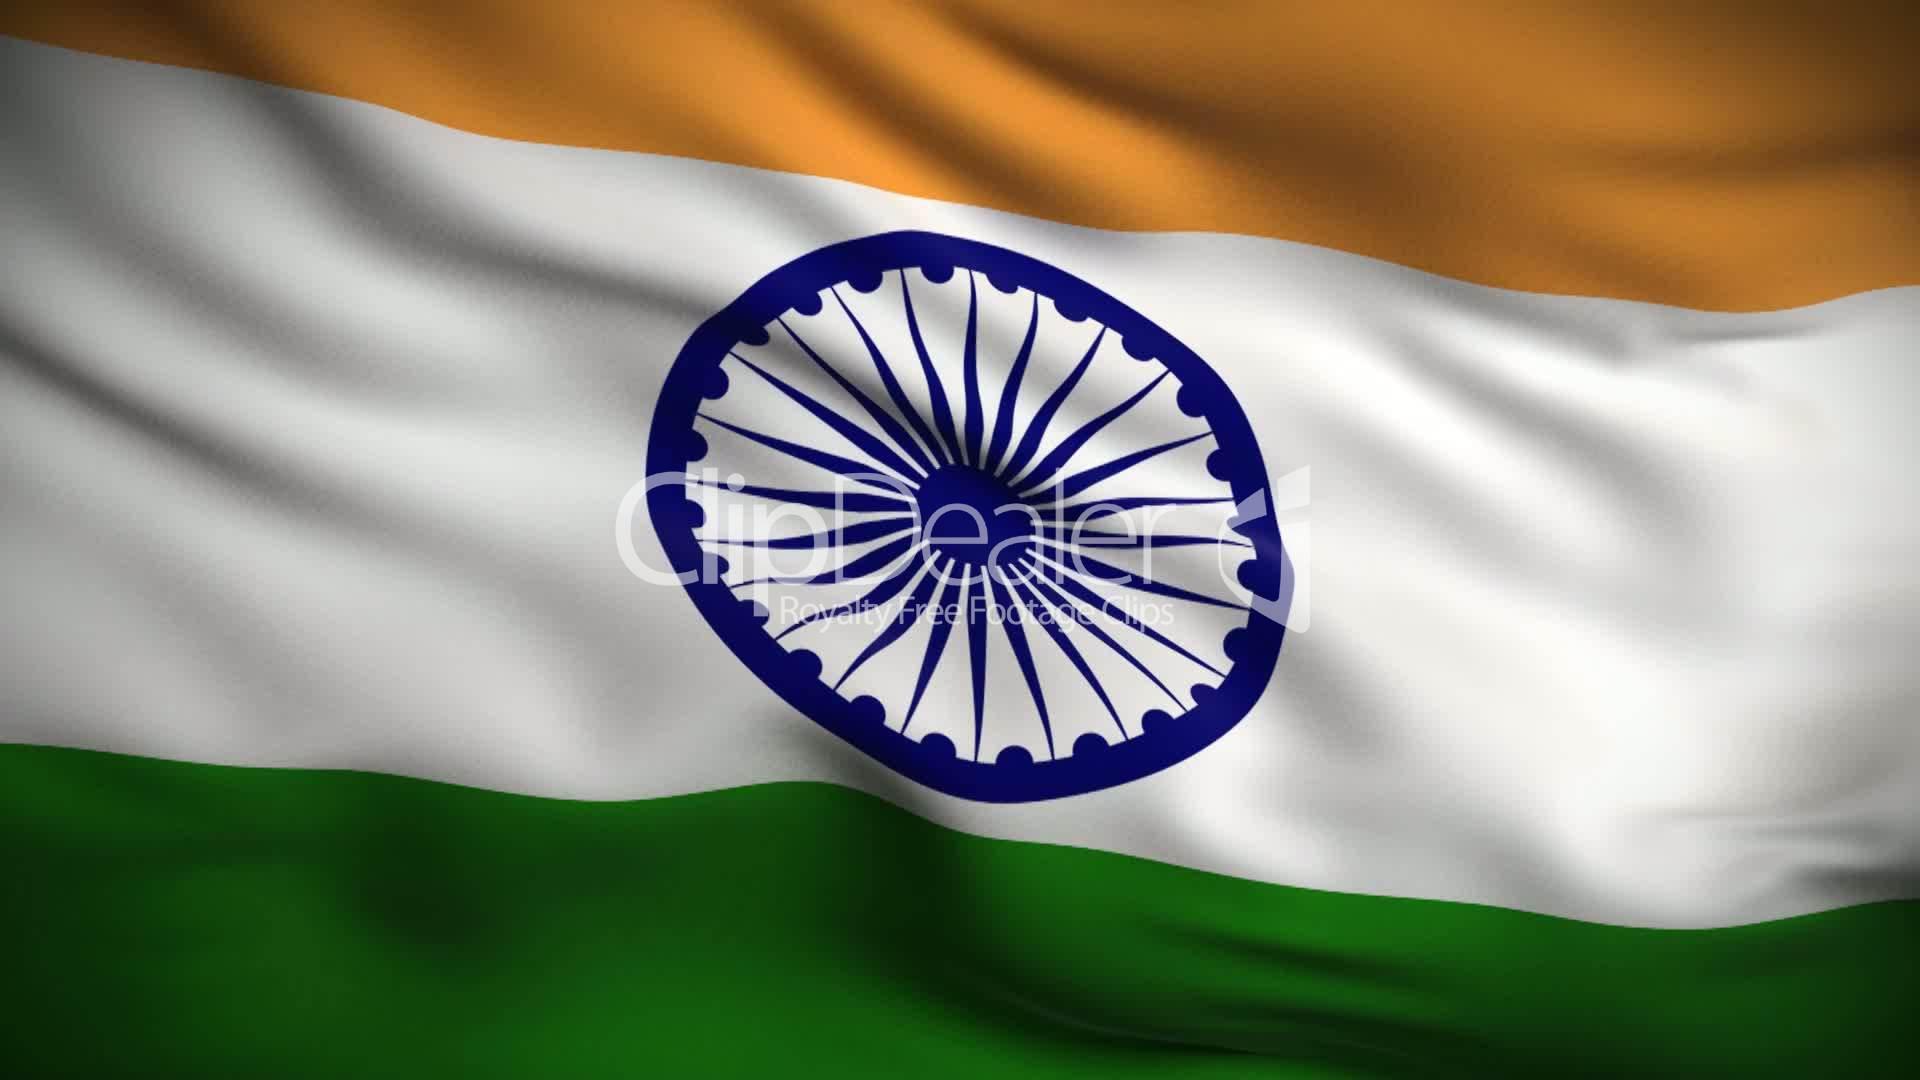 Indian Flag Hd Looped Vidéos Et Clips Libres De Droits